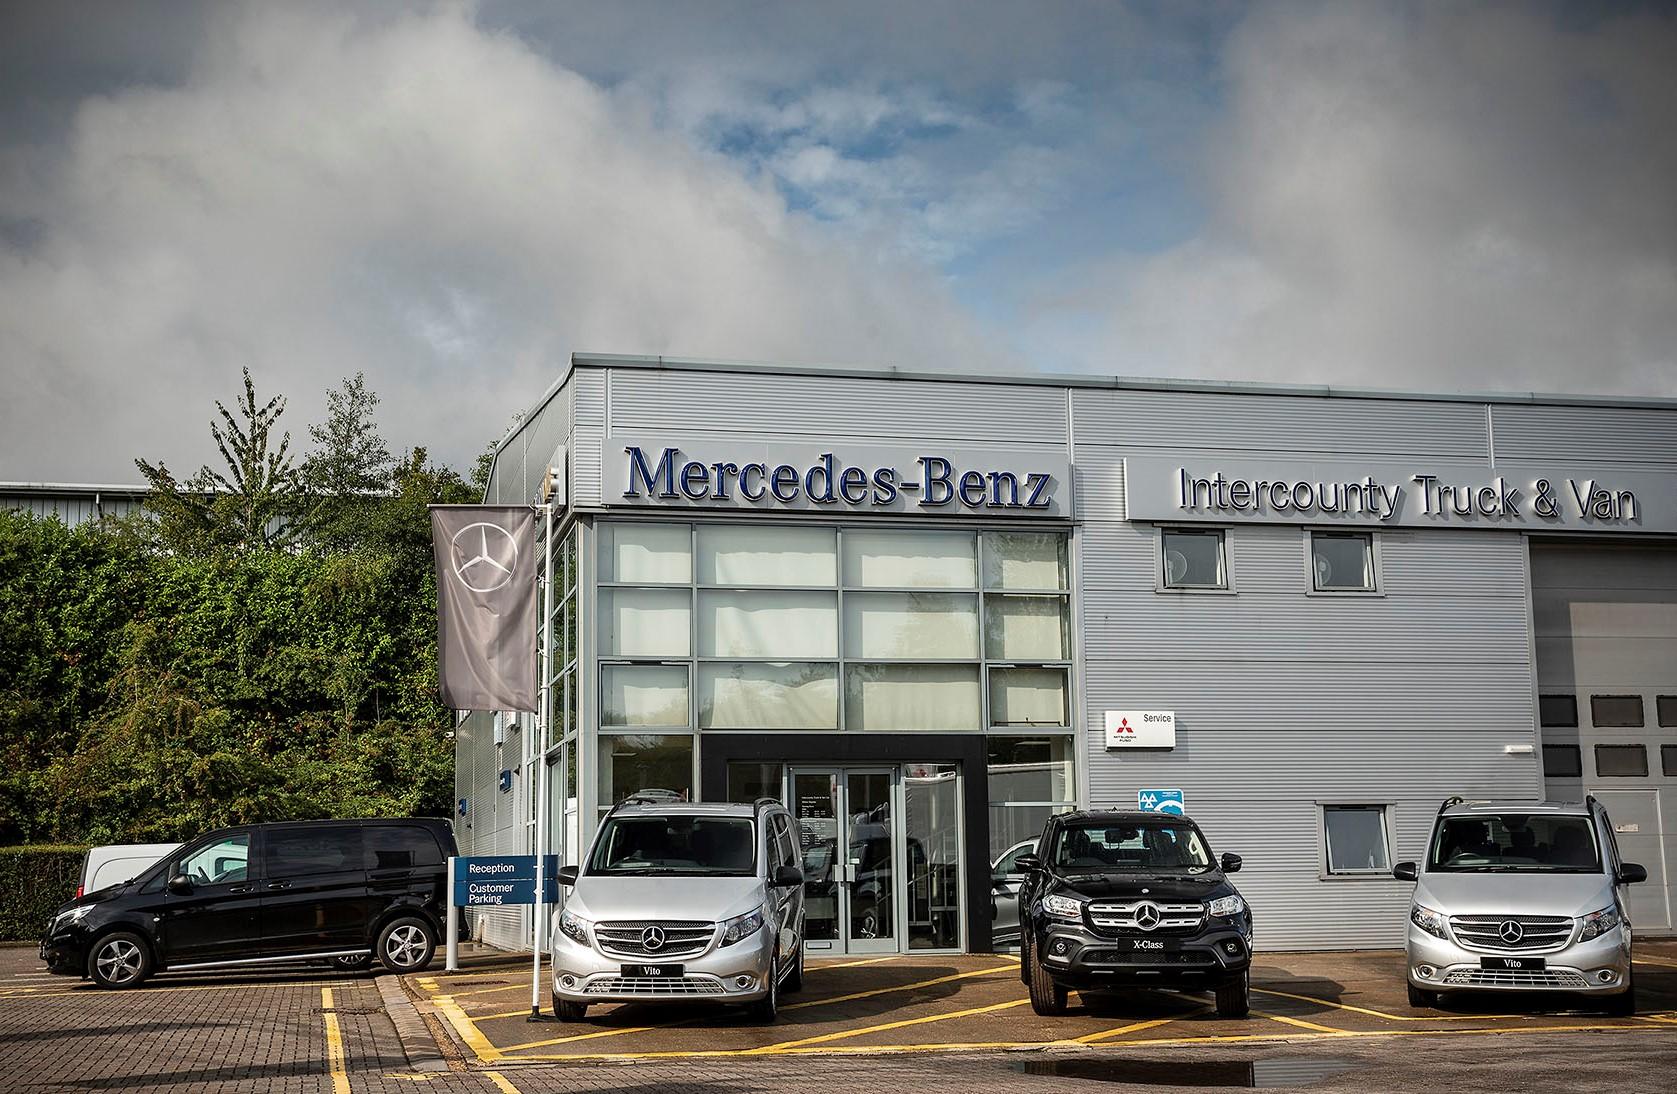 mercedes-benz dealer intercounty opens on saturdays for van sales